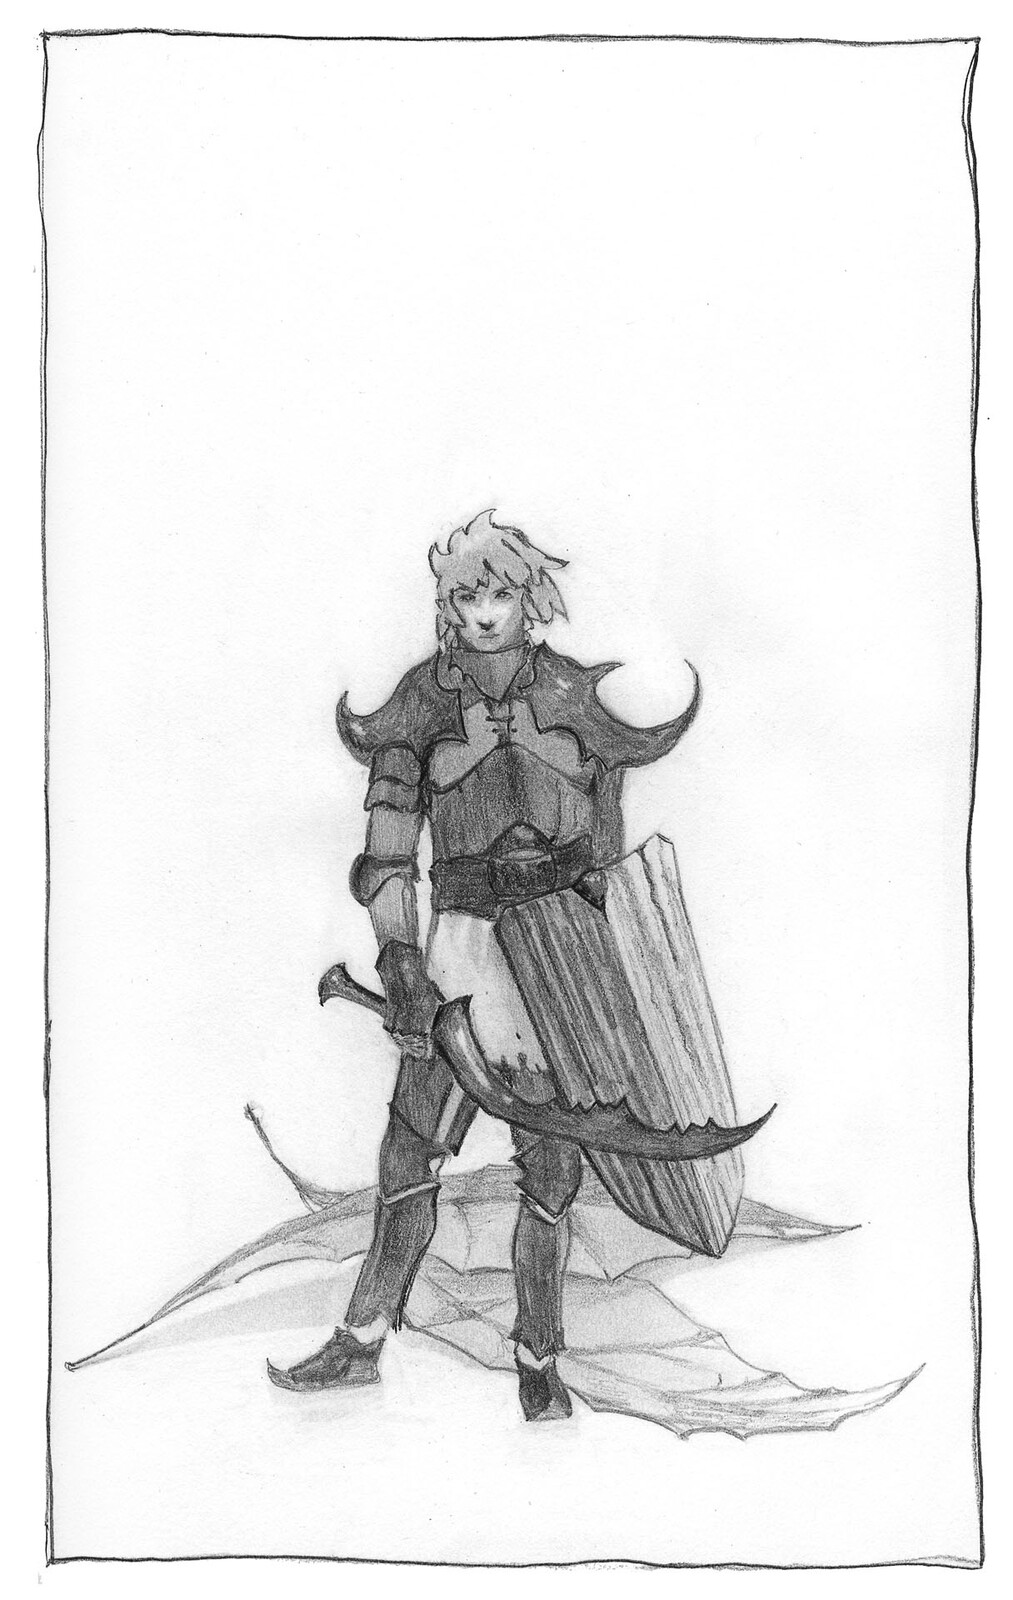 Inktober 2020 day 14 : armor